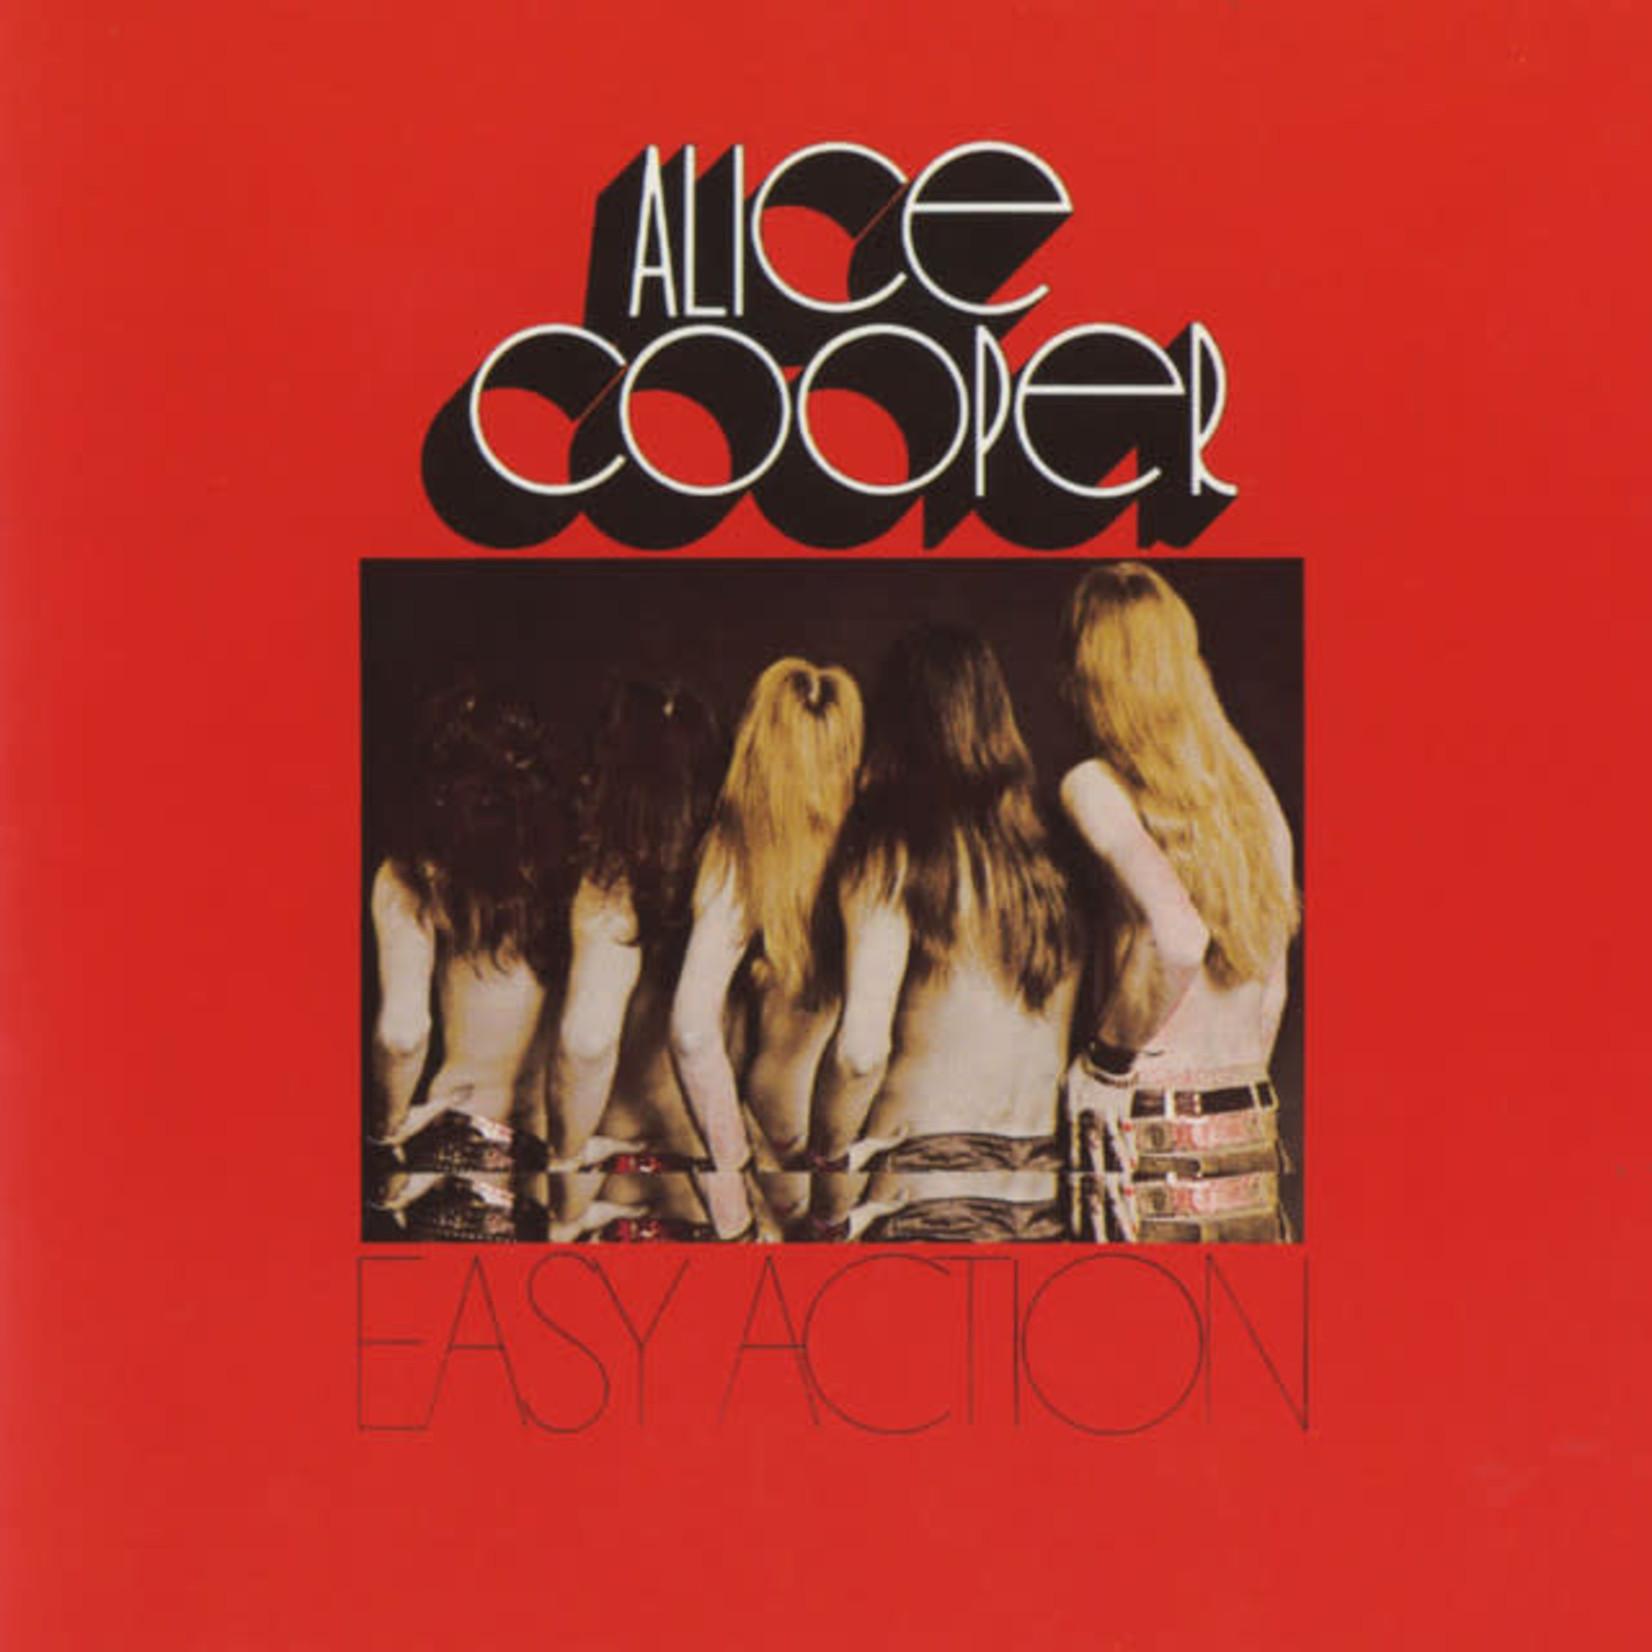 Vinyl Alice Cooper - Easy Action